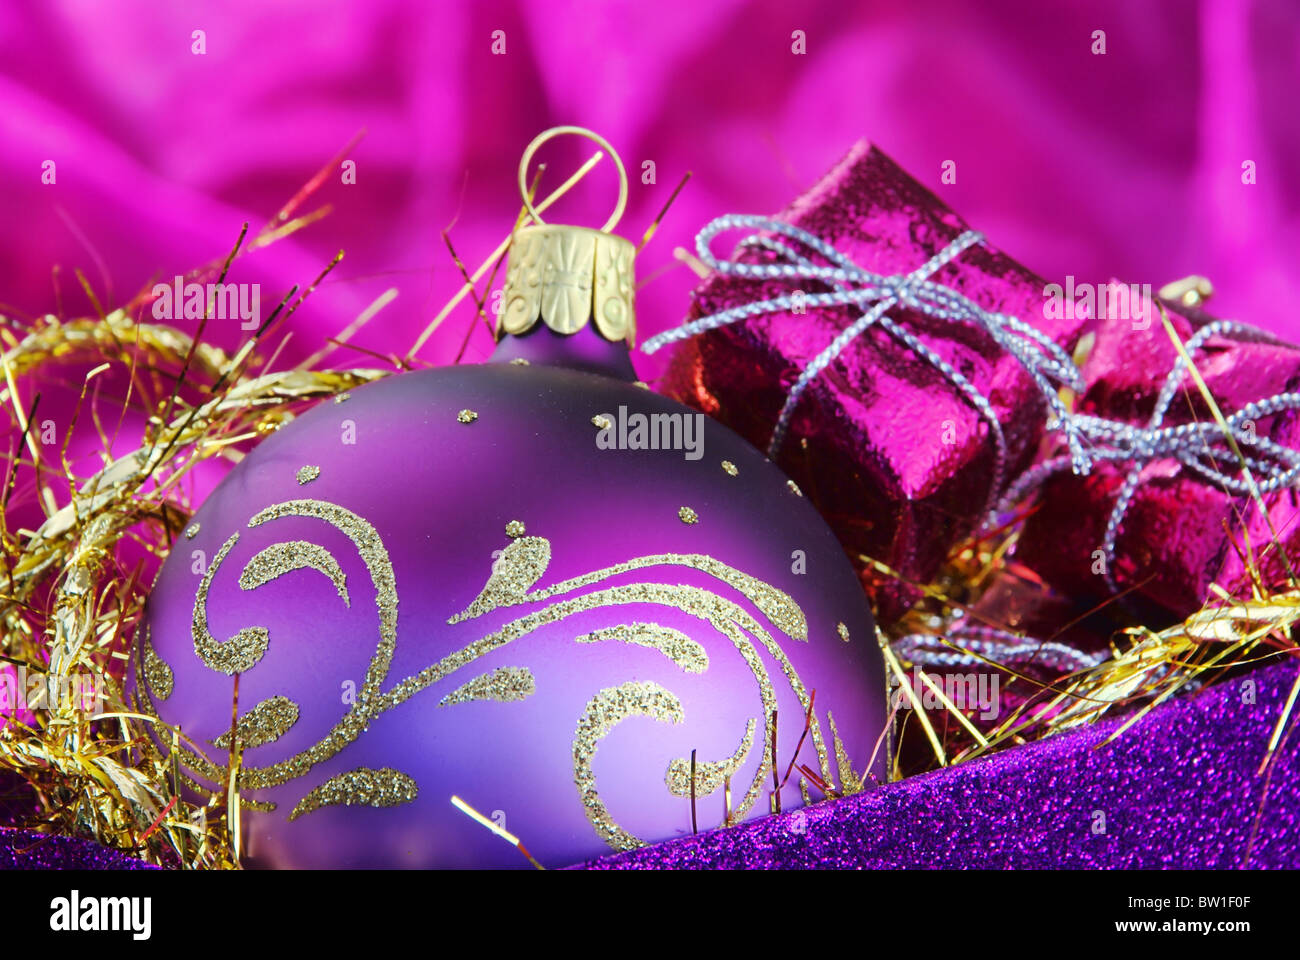 Weihnachtskugel - christmas ball 83 - Stock Image